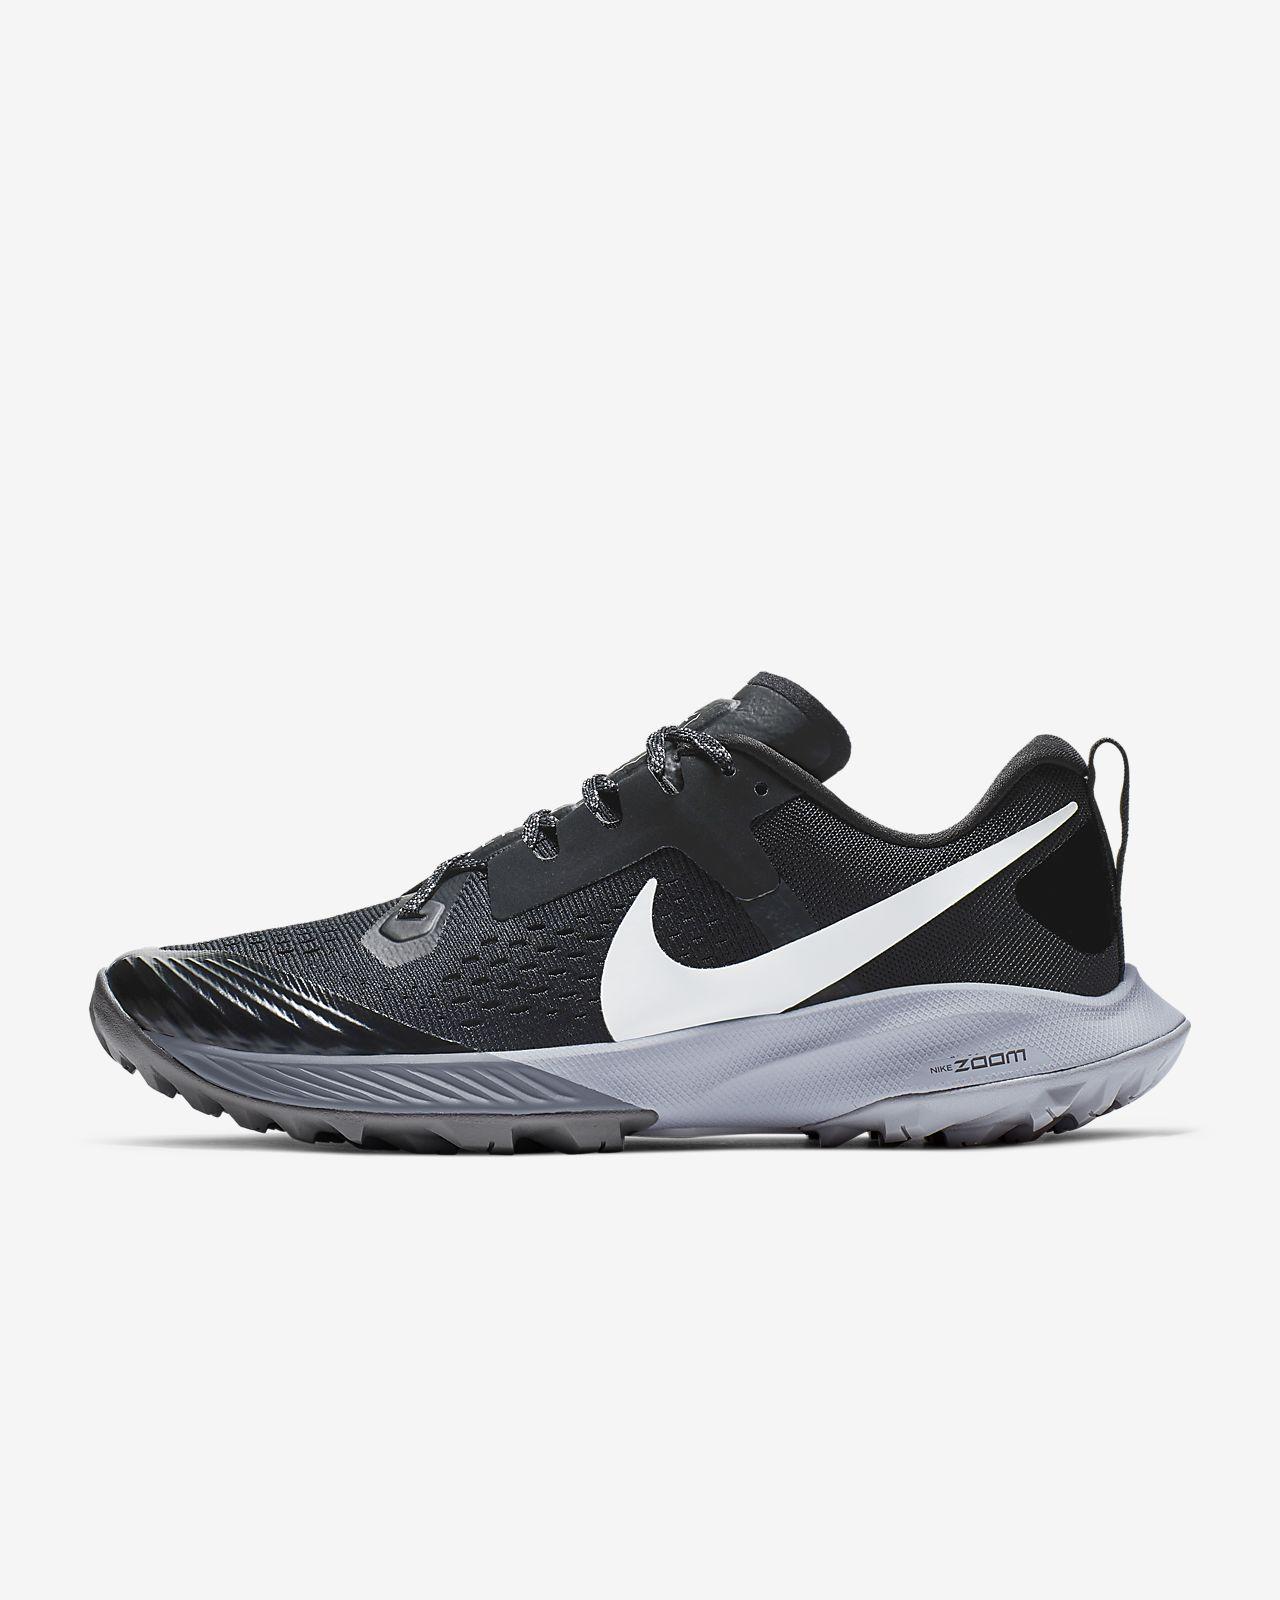 17329fdb73a9 Nike Air Zoom Terra Kiger 5 Women s Running Shoe. Nike.com